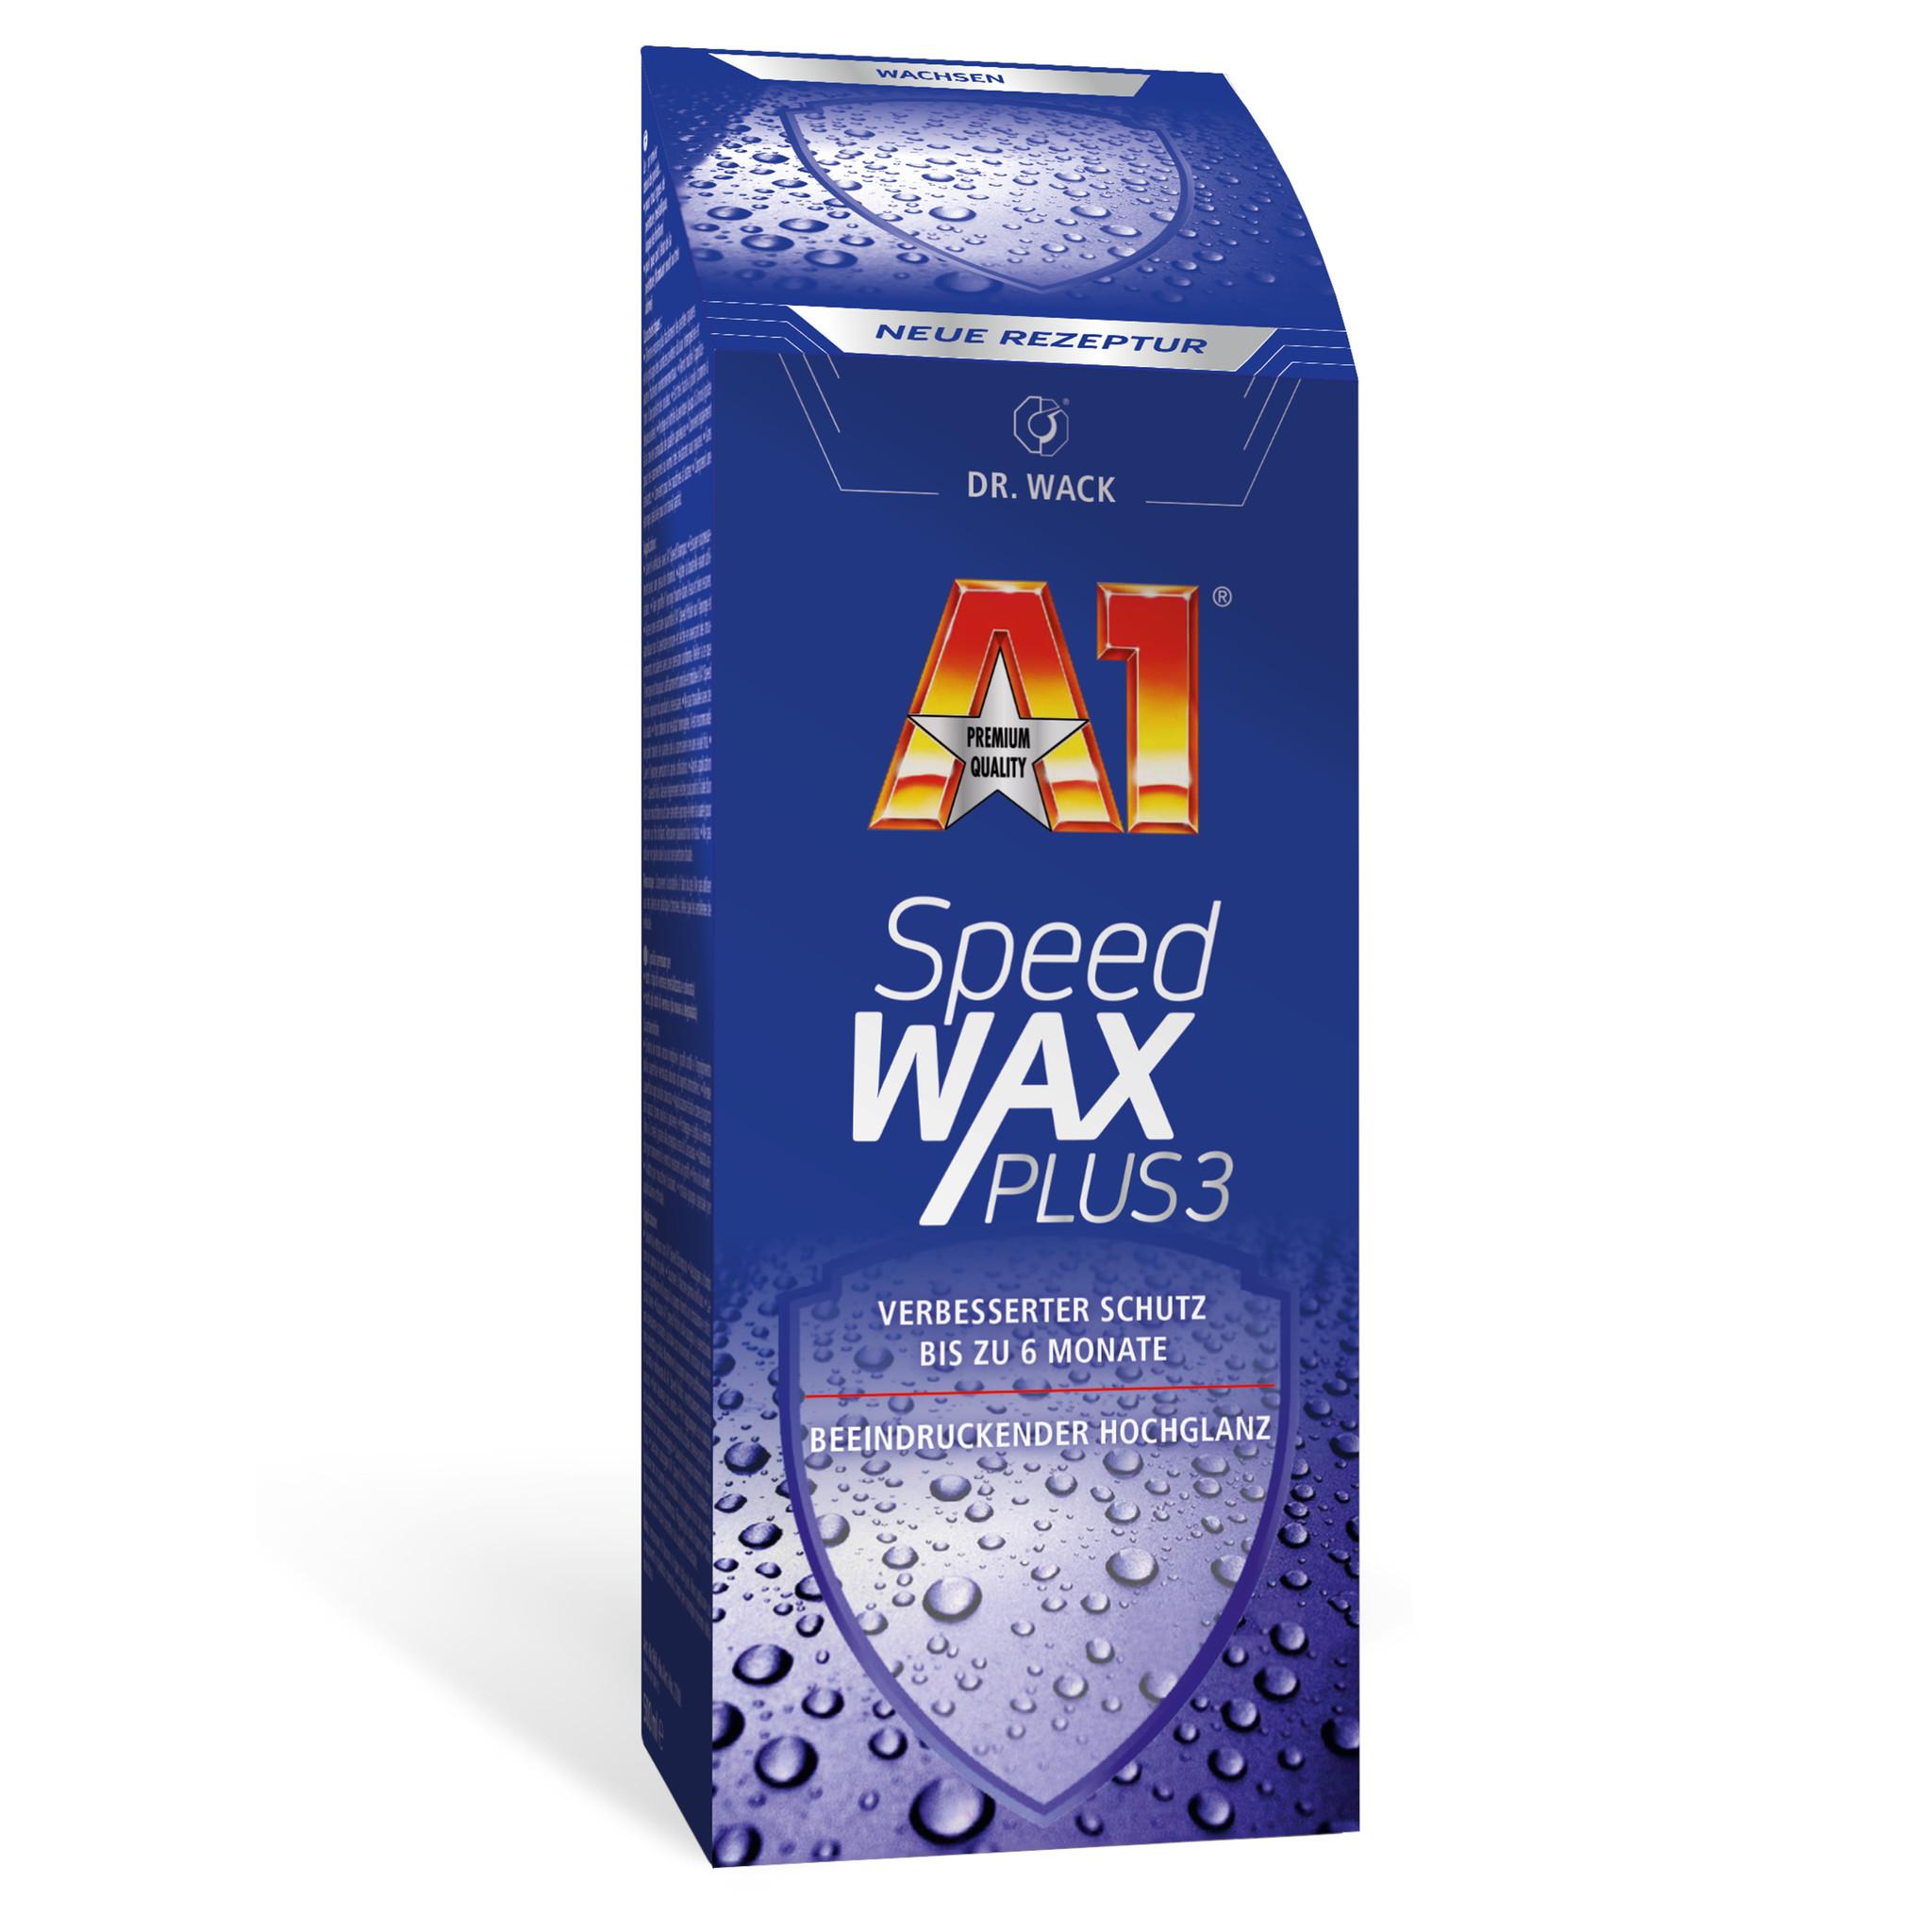 Dr. Wack Dr. Wack A1 Speed Wax Plus 3